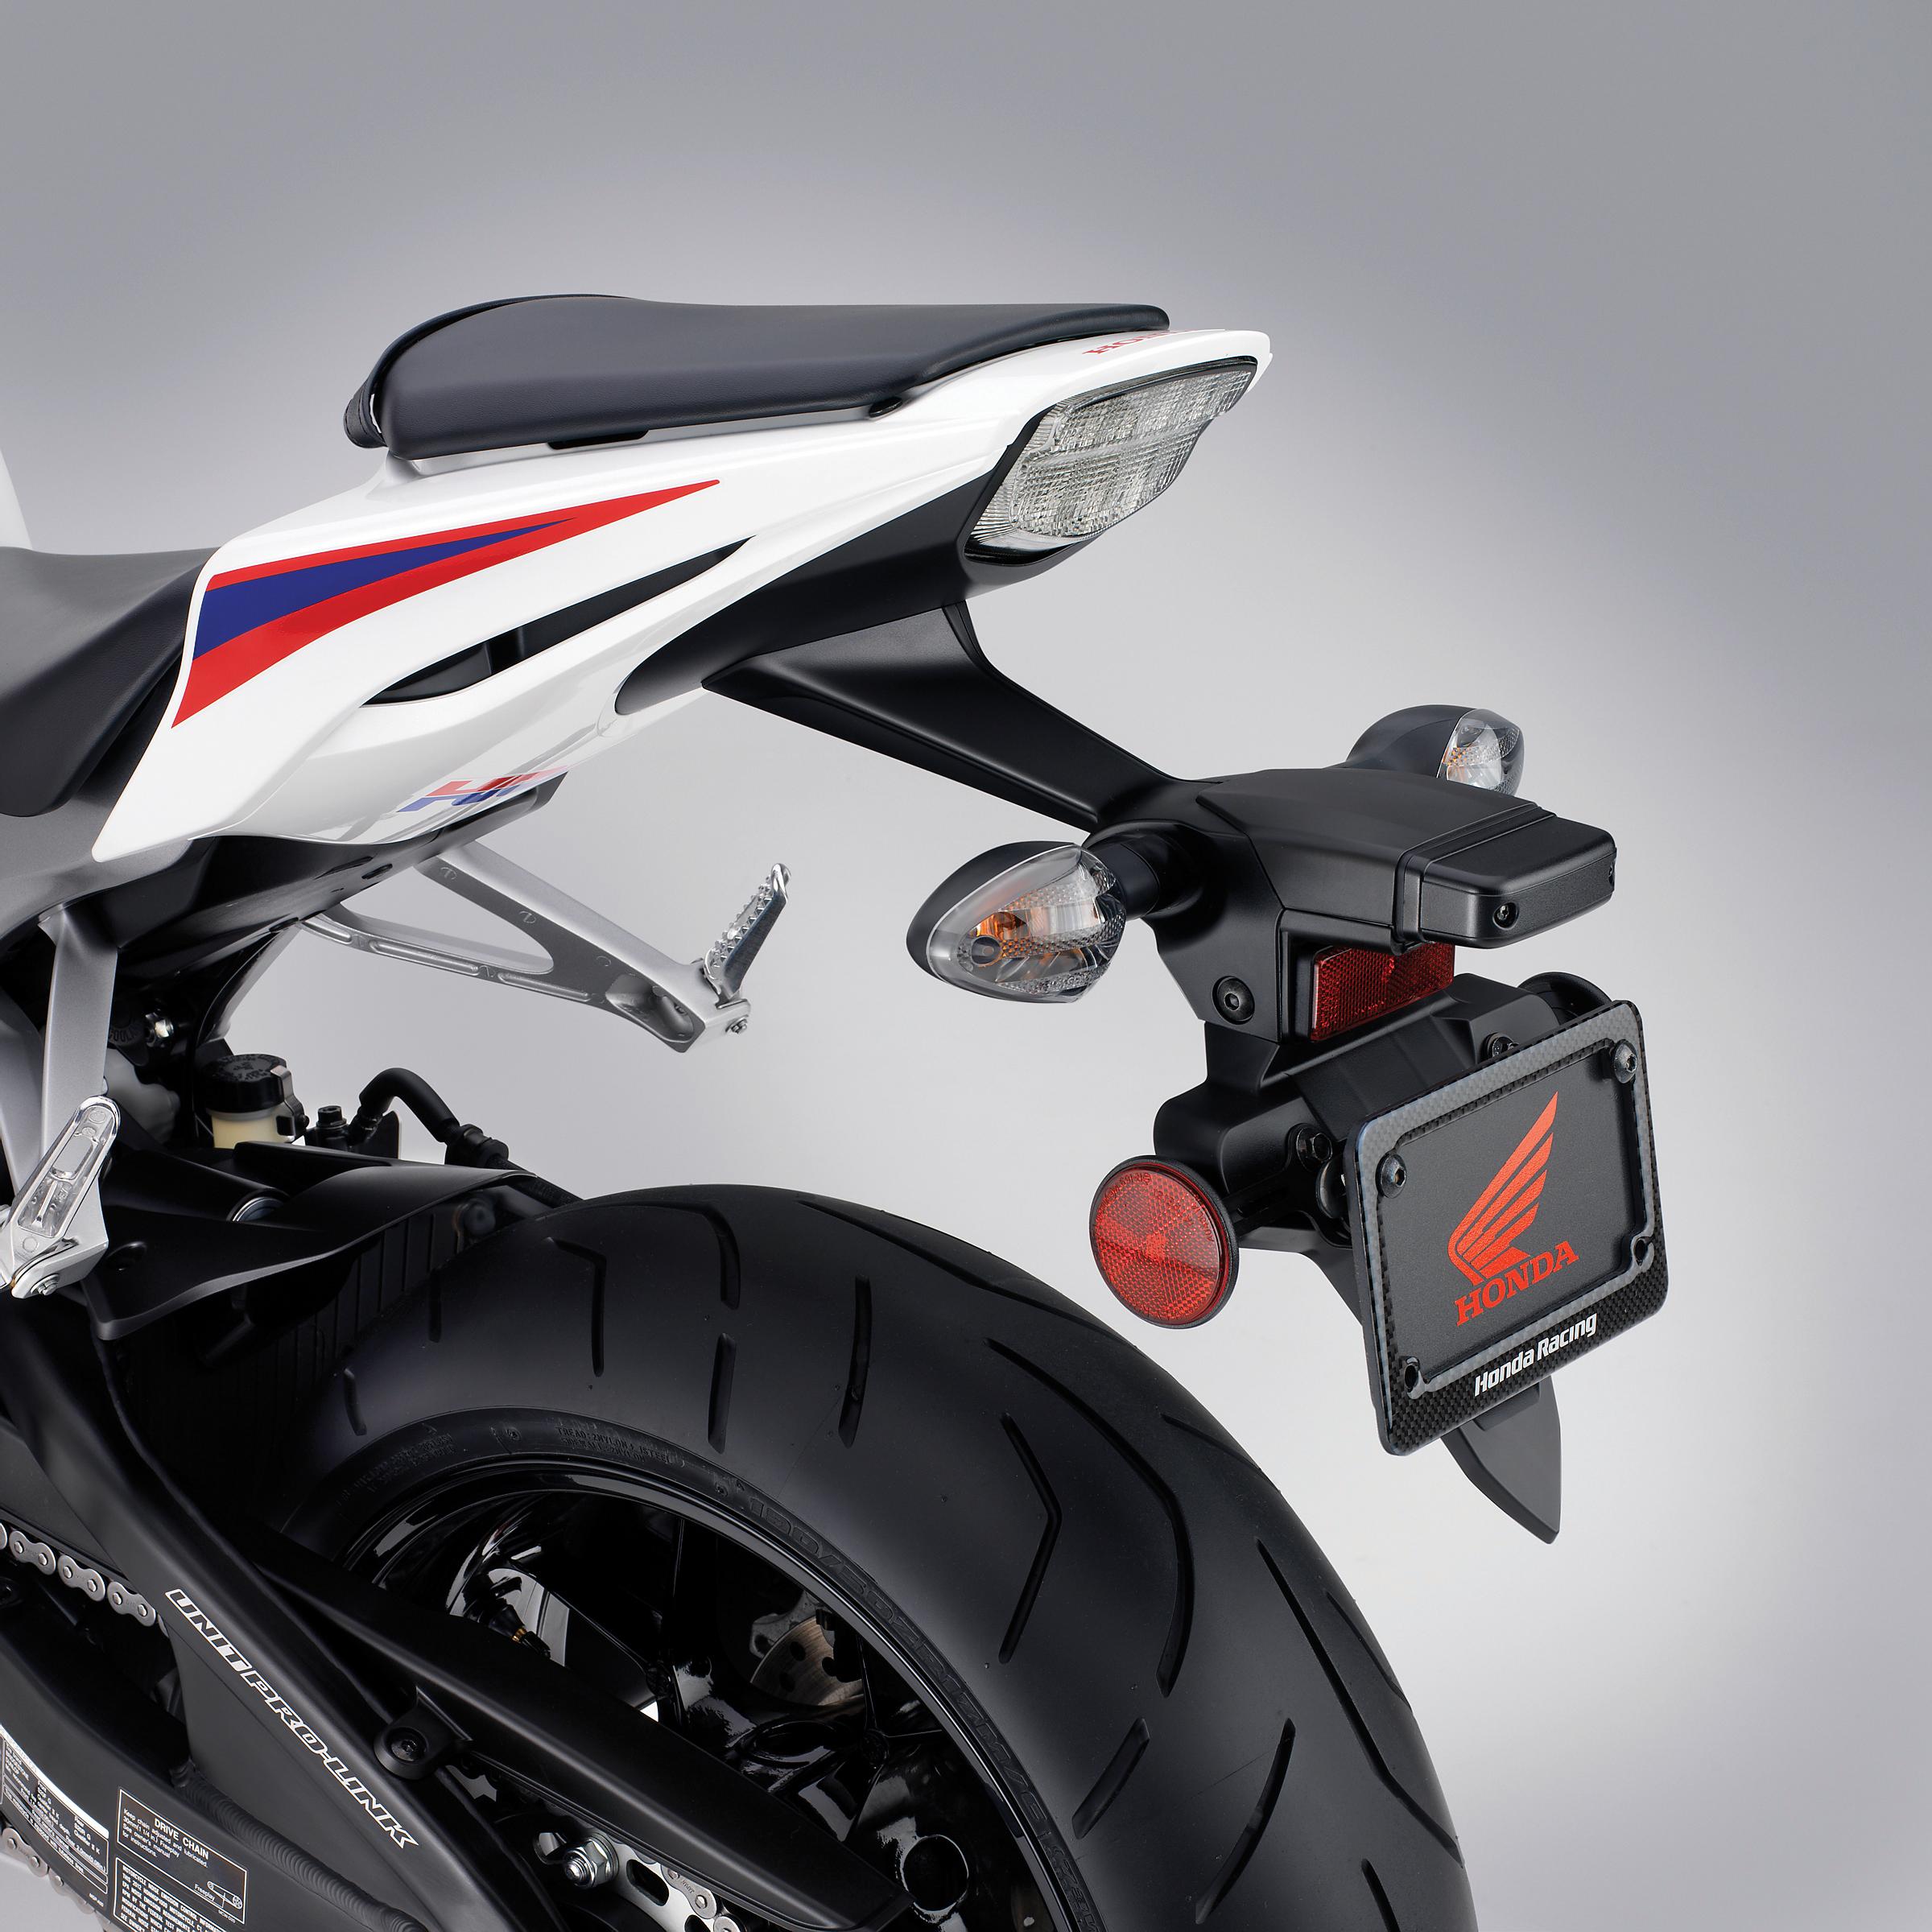 For Sale: Honda CBR1000RR Fireblade • The Bike Market